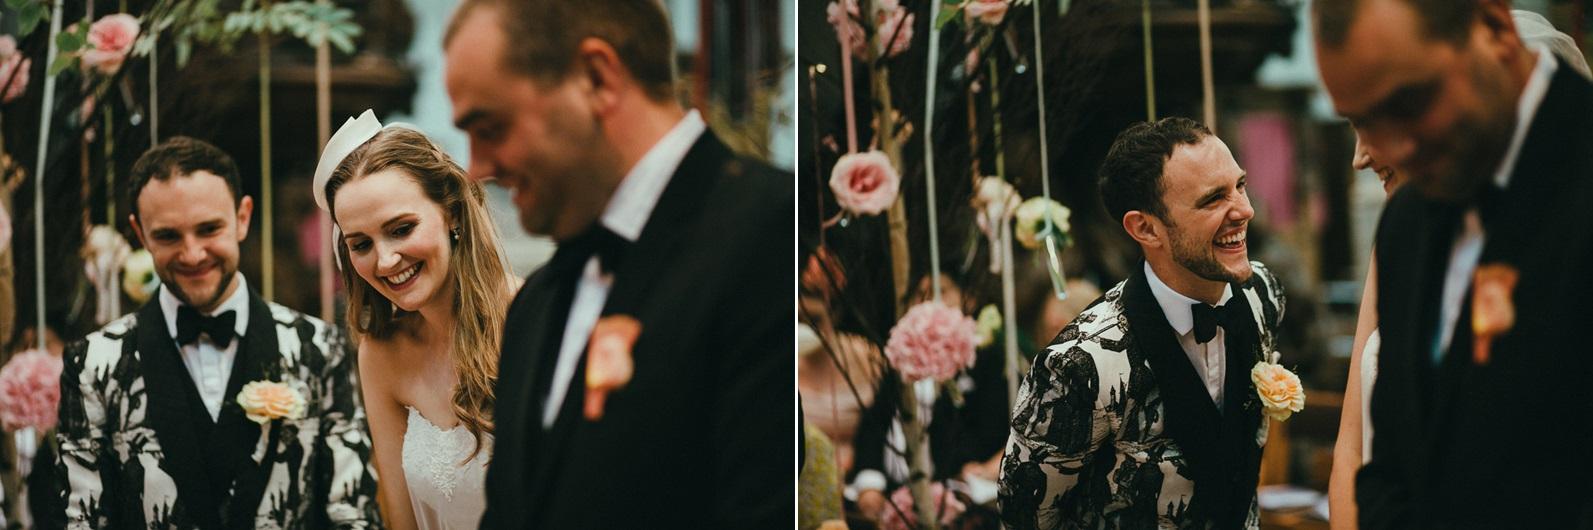 chateau-wedding-photography (58).jpg